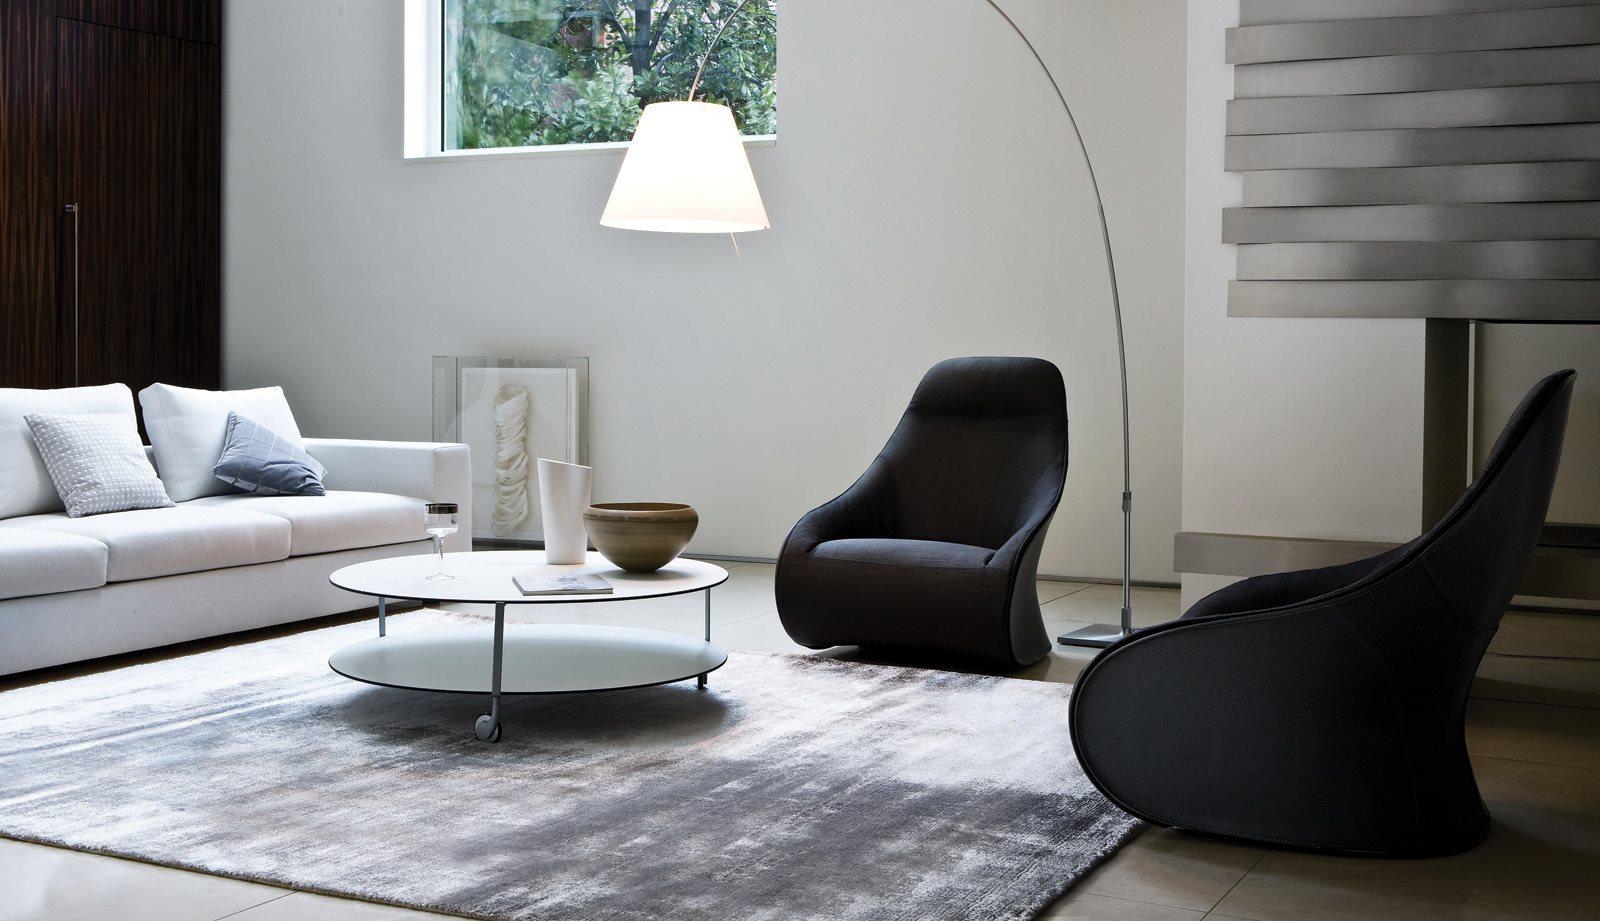 4 Stylish Modern Living Room Furniture - W. Atelier